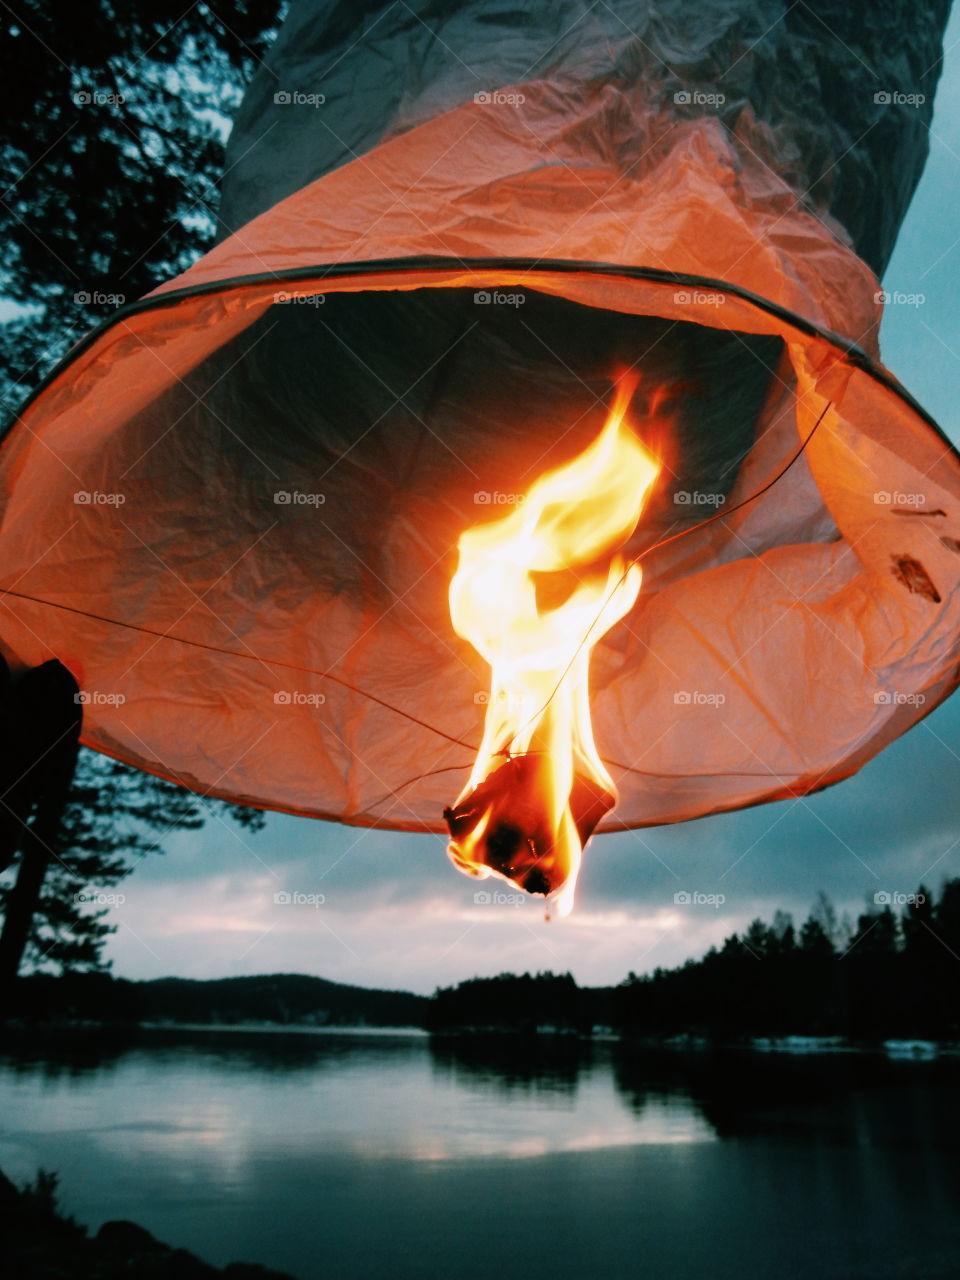 Sky lantern flying on sky